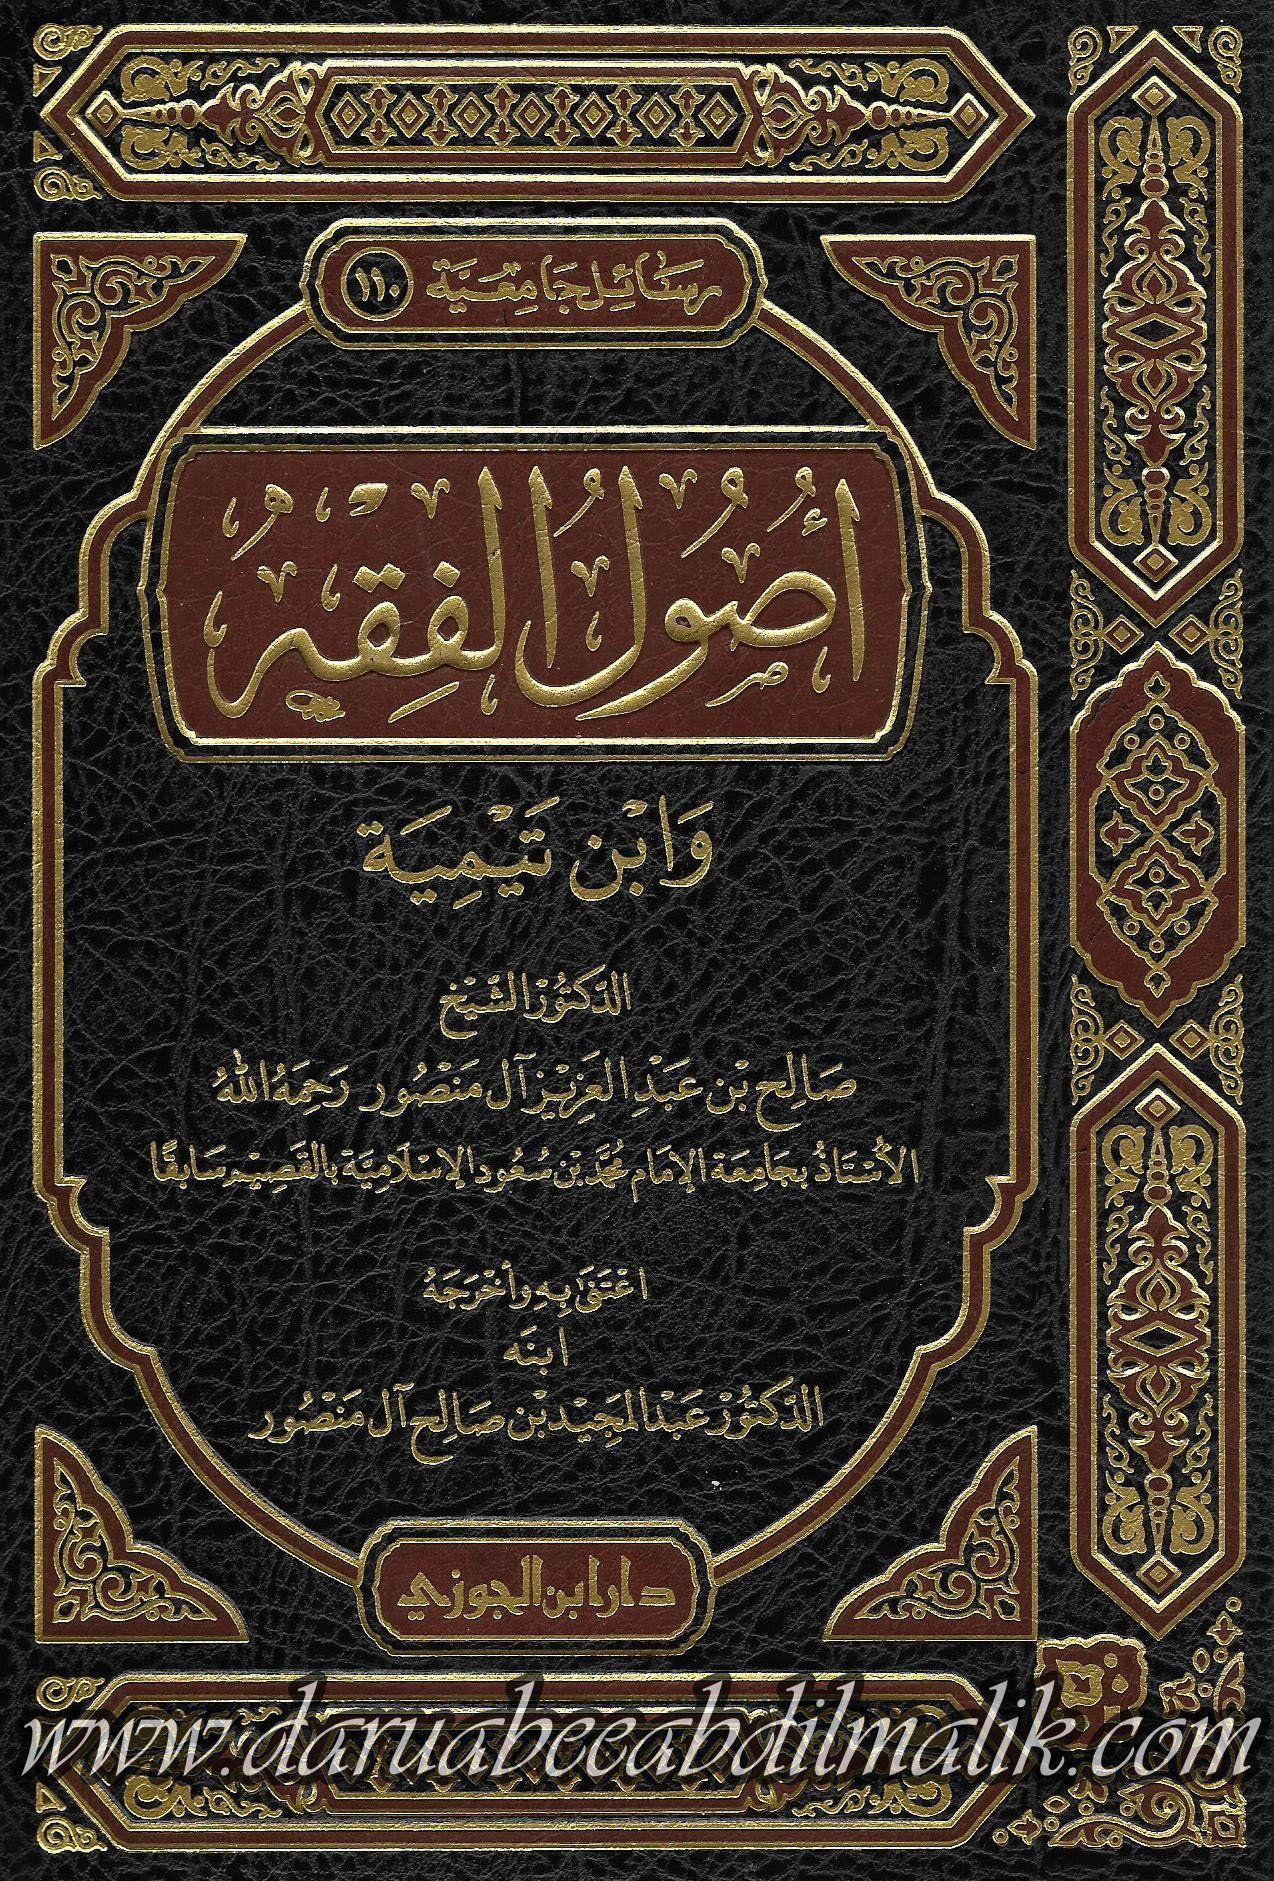 Usool Al Fiqh Wa Ibn Taymiyyah أصول الفقه وابن تيمية Daruabeeabdilmalik Any Book Yellow Paper This Book